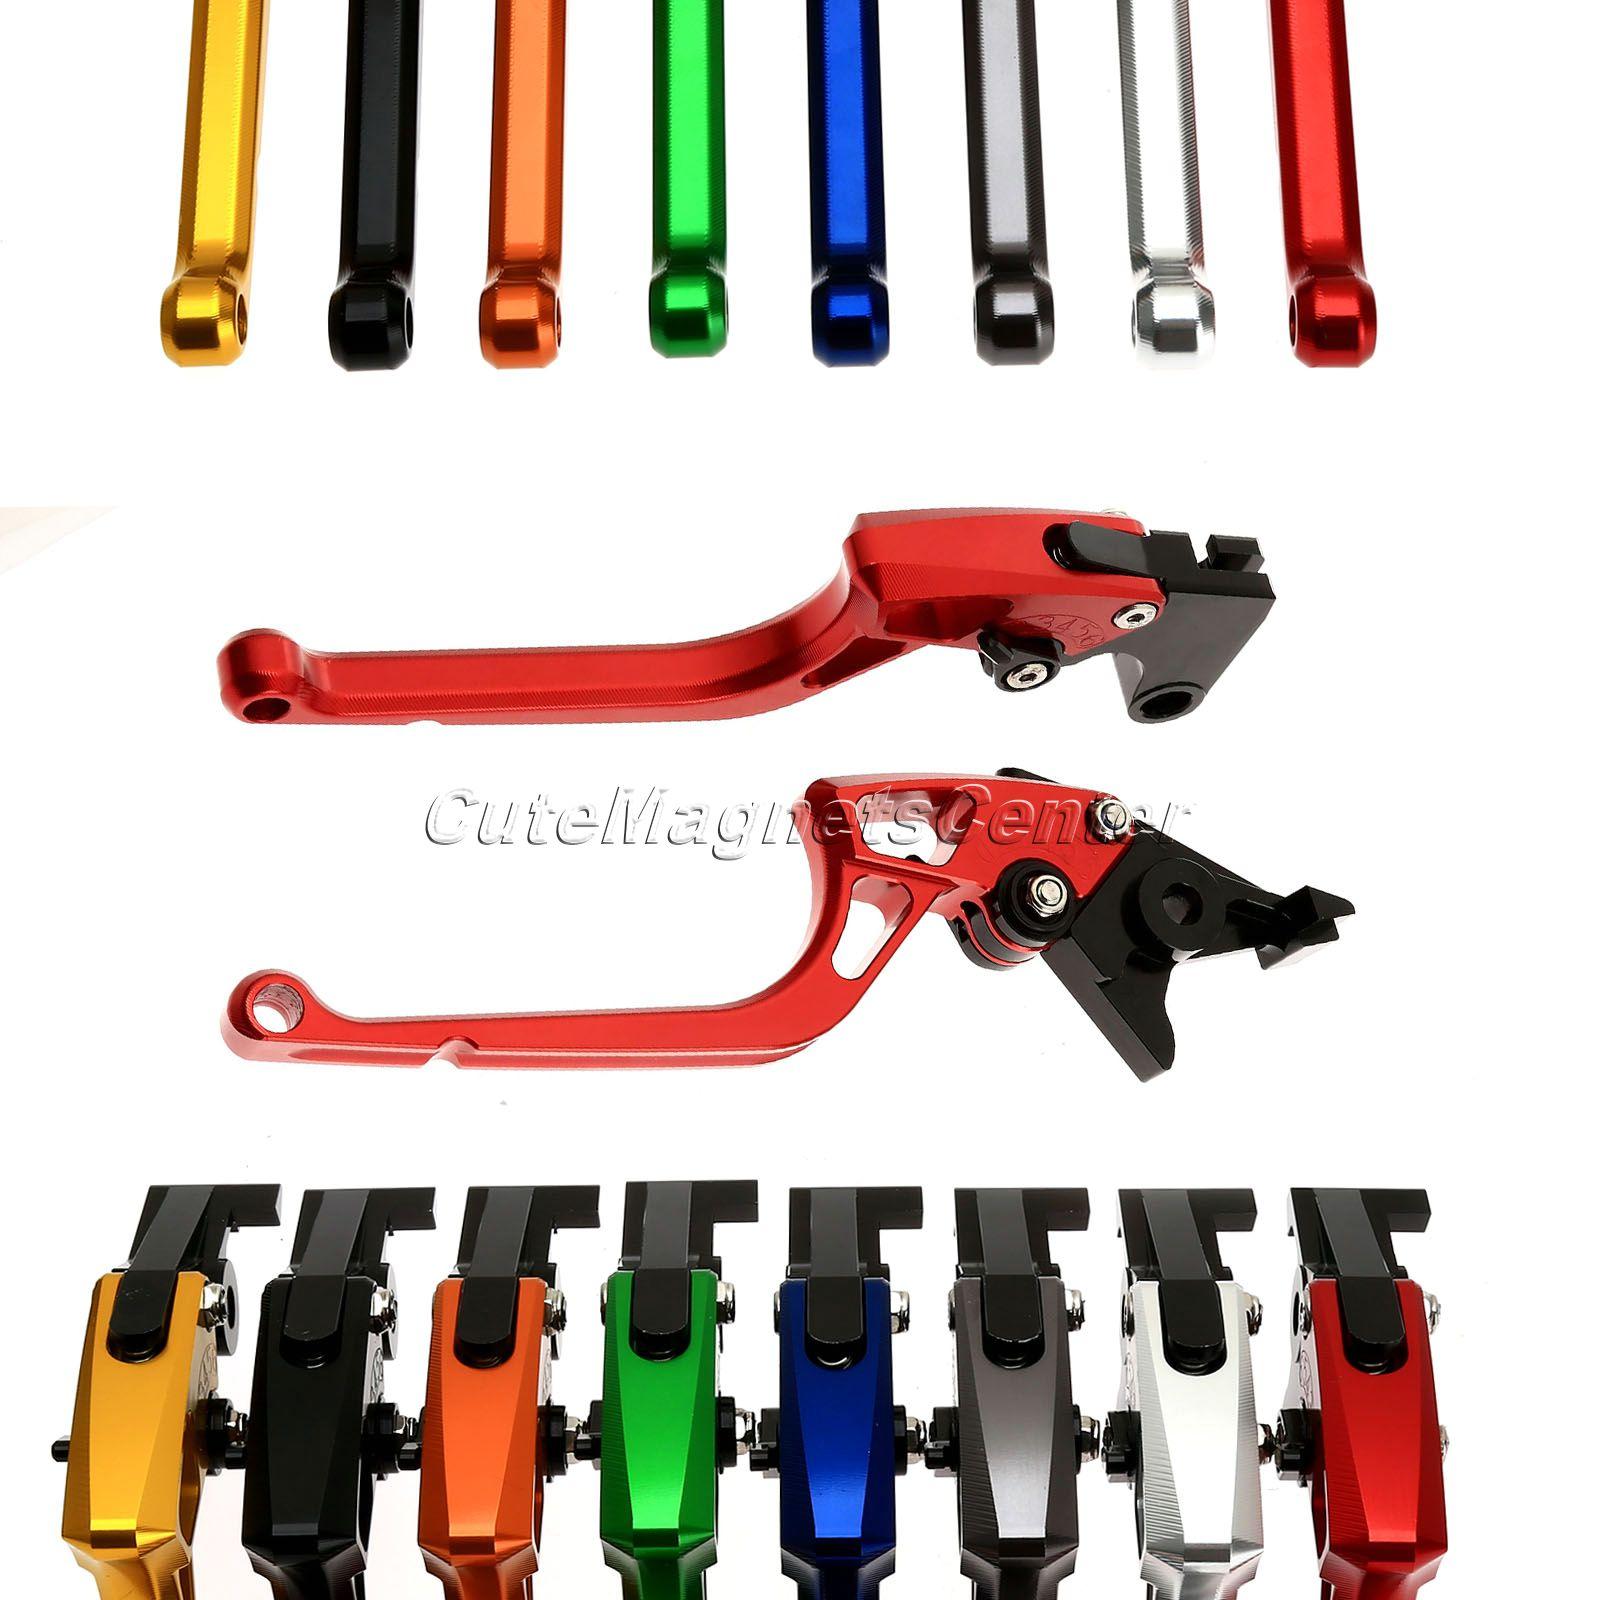 ФОТО New Adjustable Motorcycle CNC Aluminum Brakes Clutch Levers for Suzuki GSXR1000 2007 2008 Motorbike Clutch Brake Lever